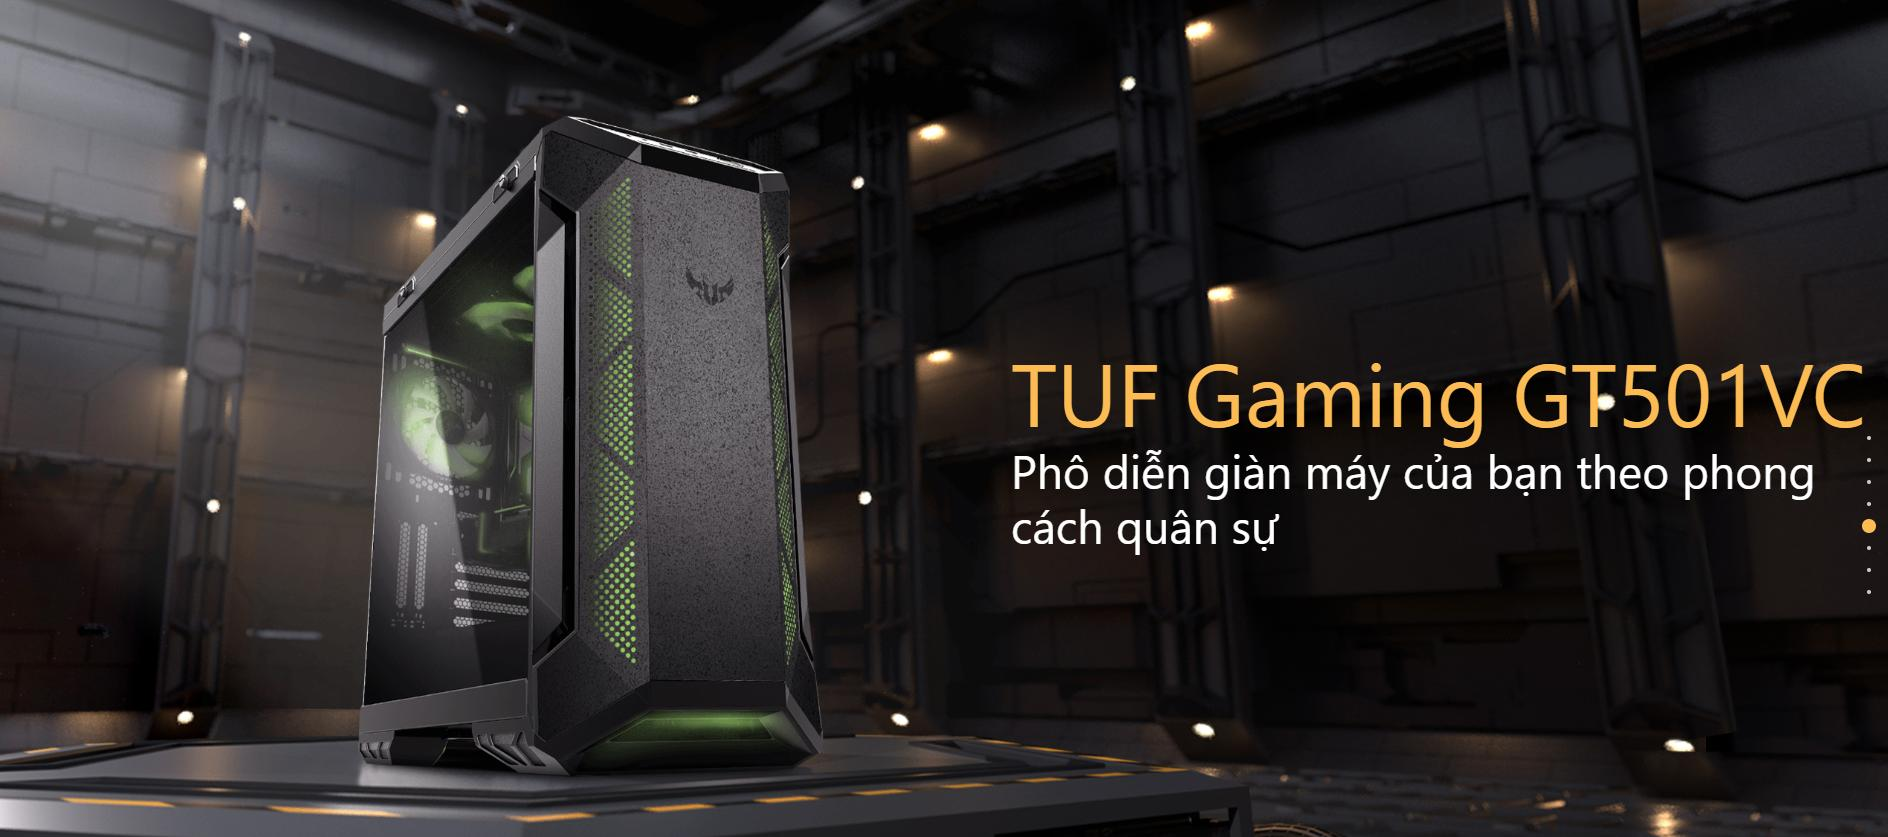 Case Asus TUF Gaming GT501VC - Tempered Glass giới thiệu